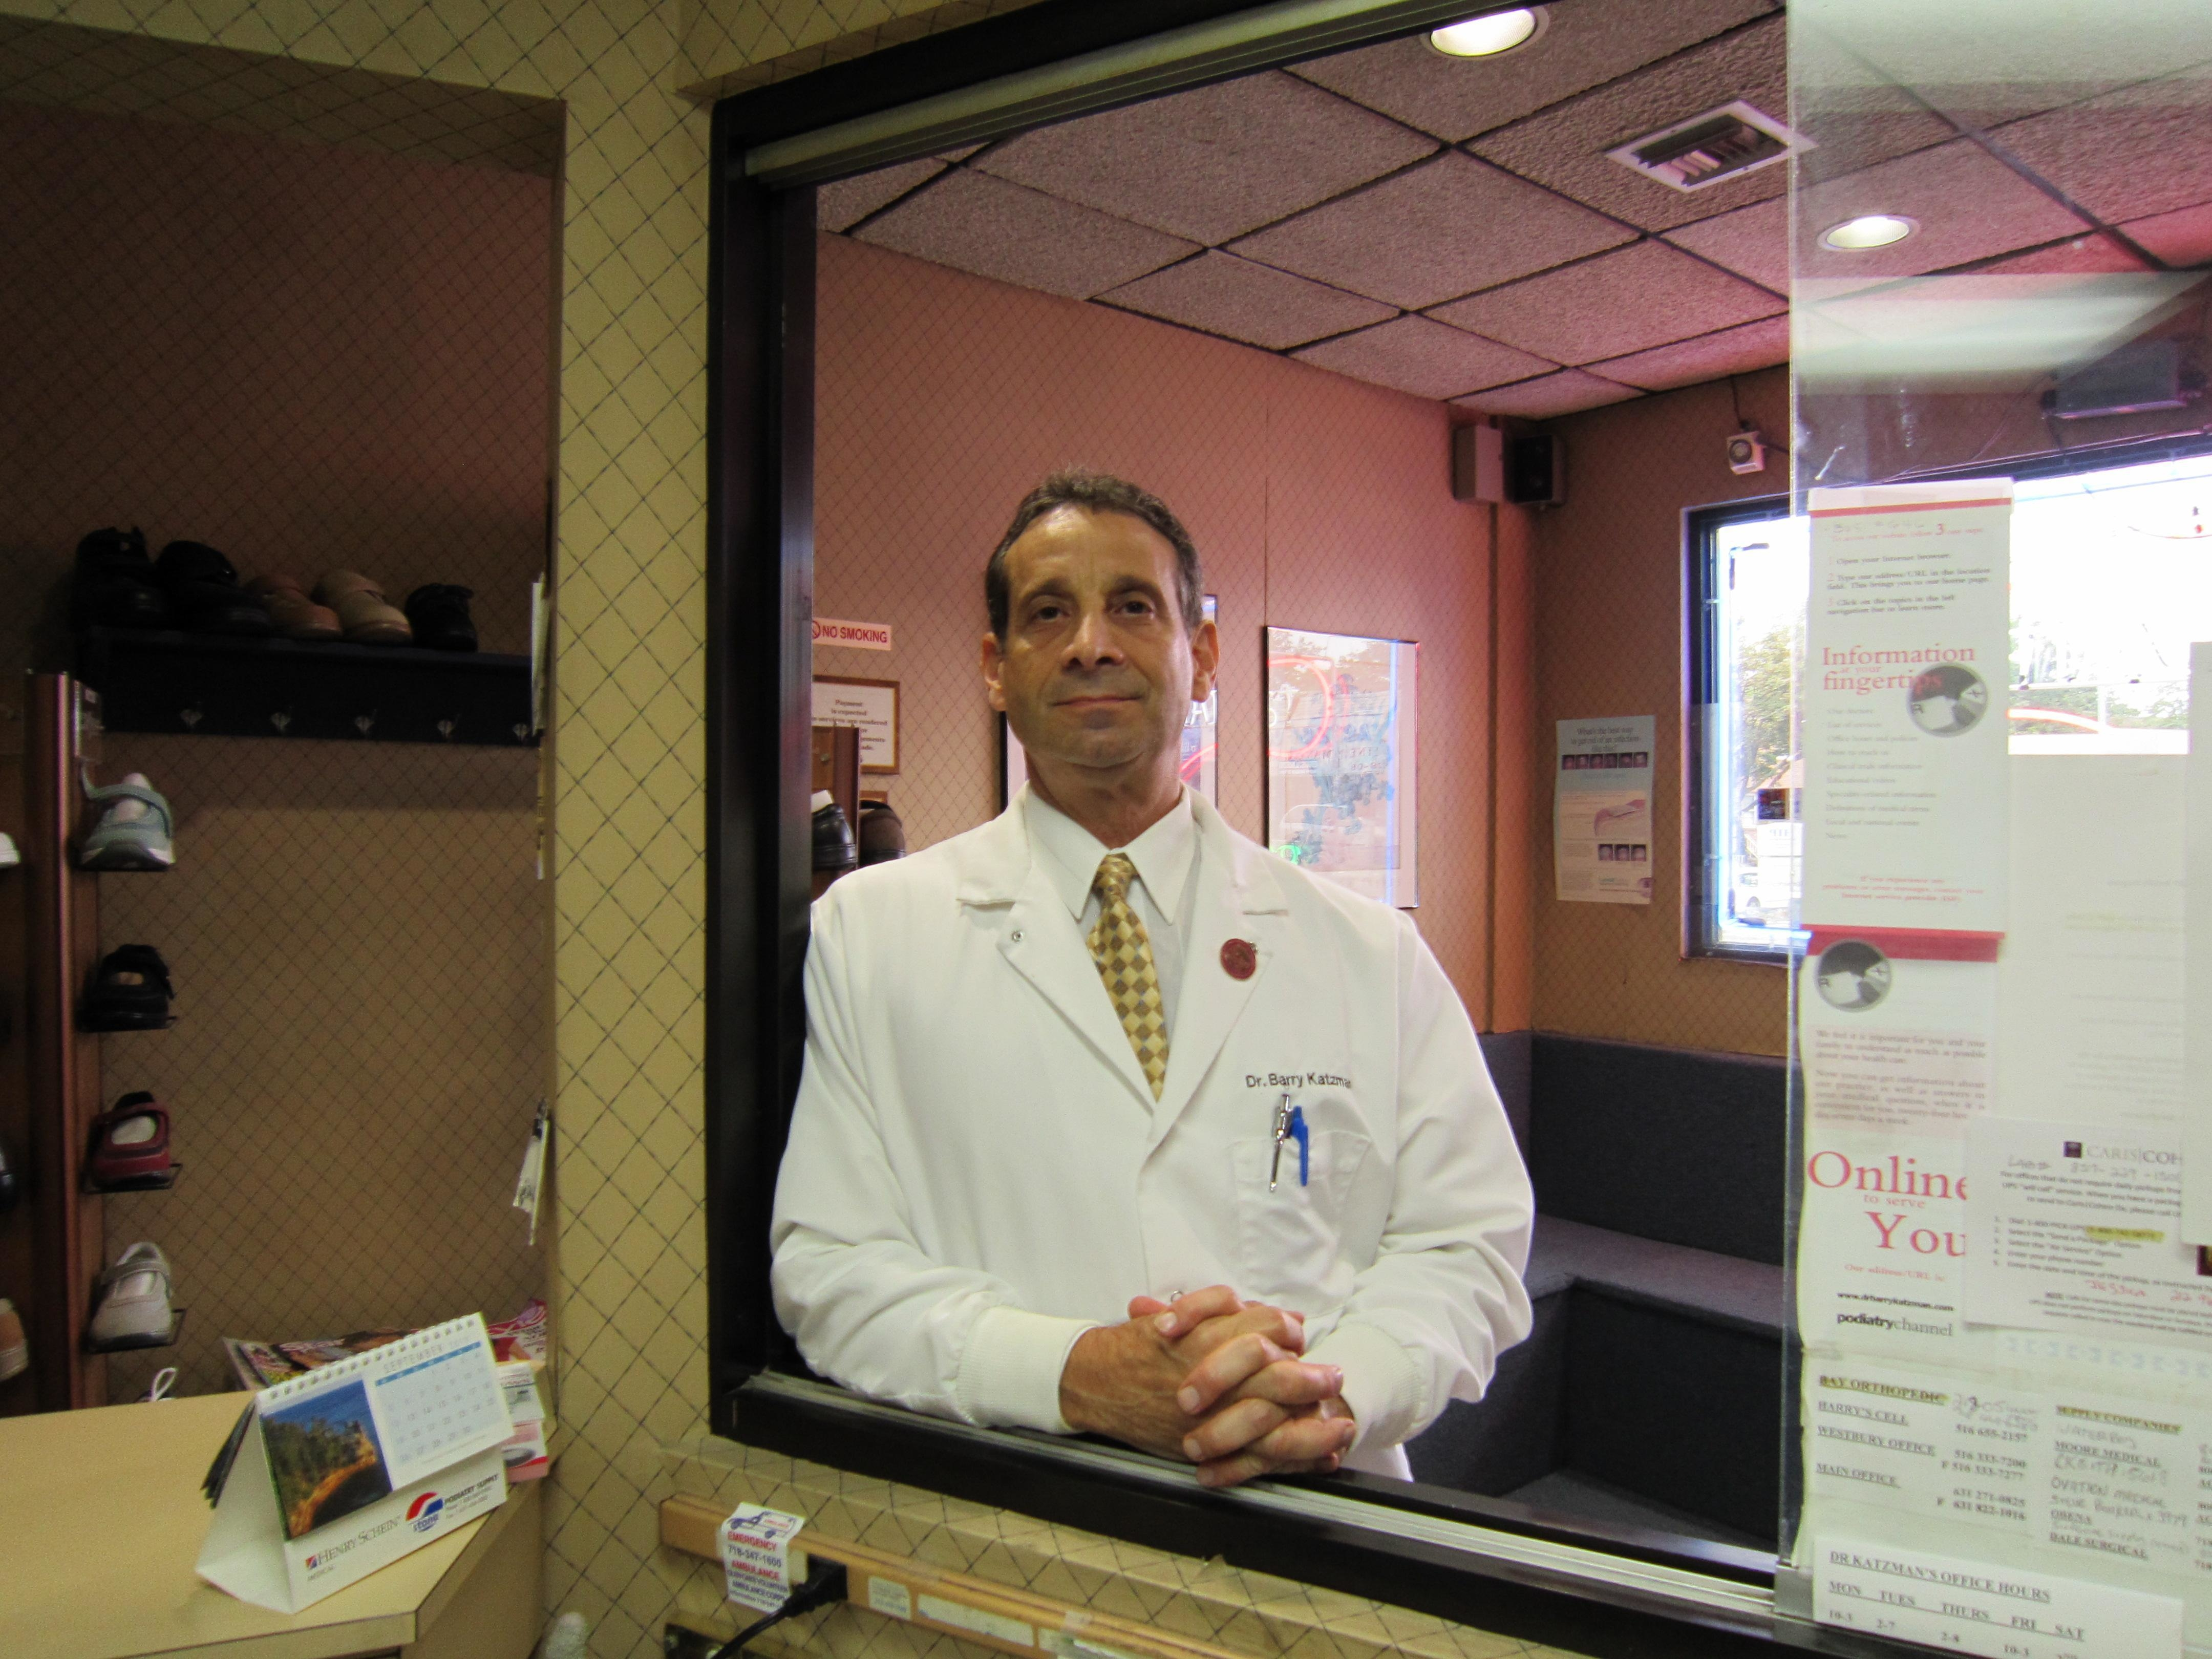 Dr Barry Katzman image 2